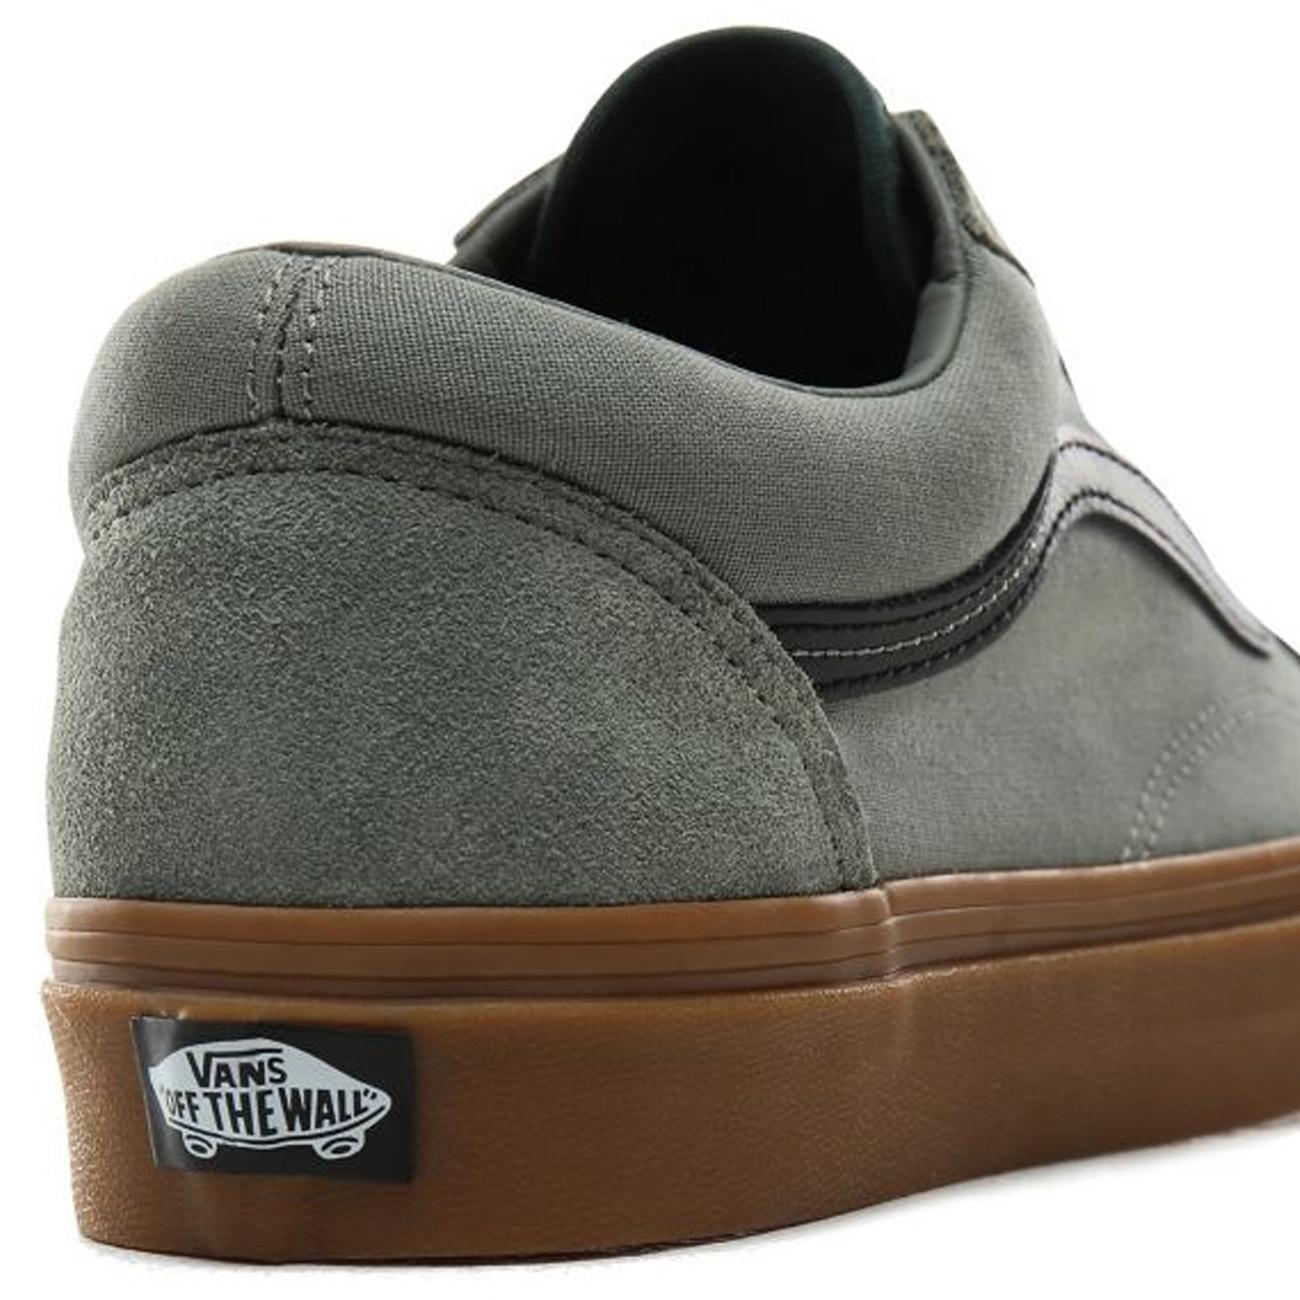 Vans Old Skool Schuh (shadow trekking green gum) kaufen bei